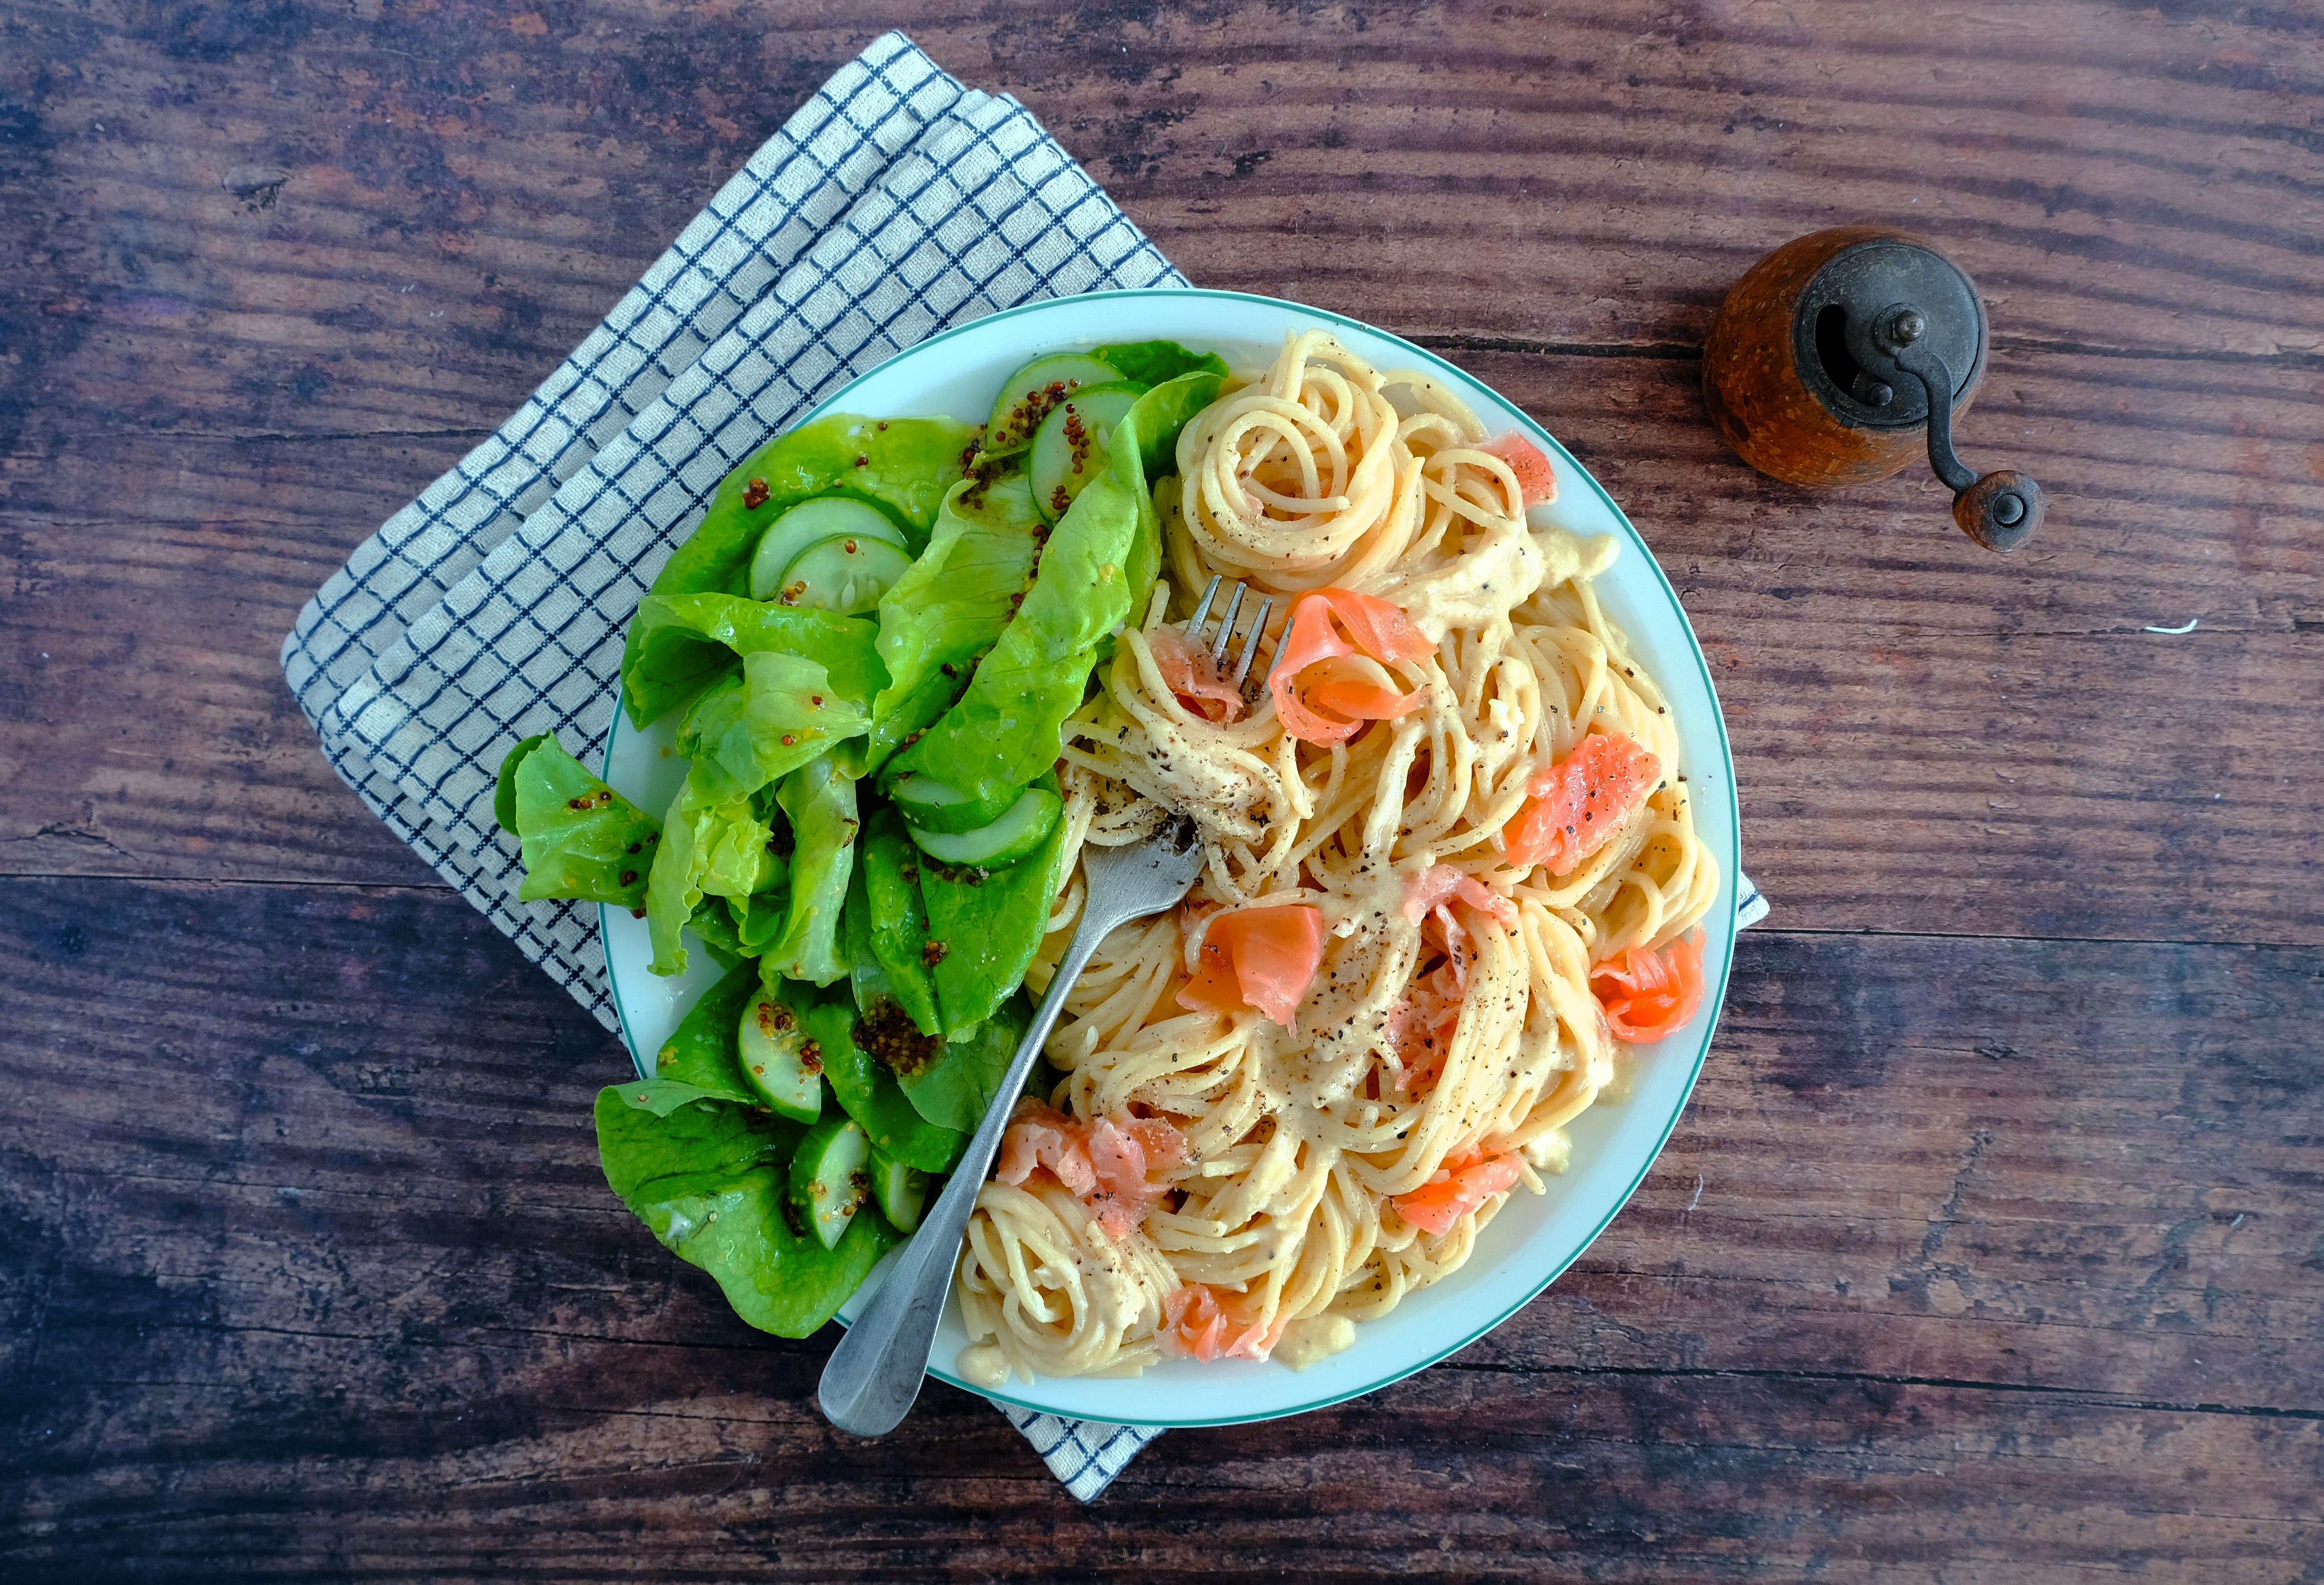 Smoked Salmon Carbonara with Green Salad